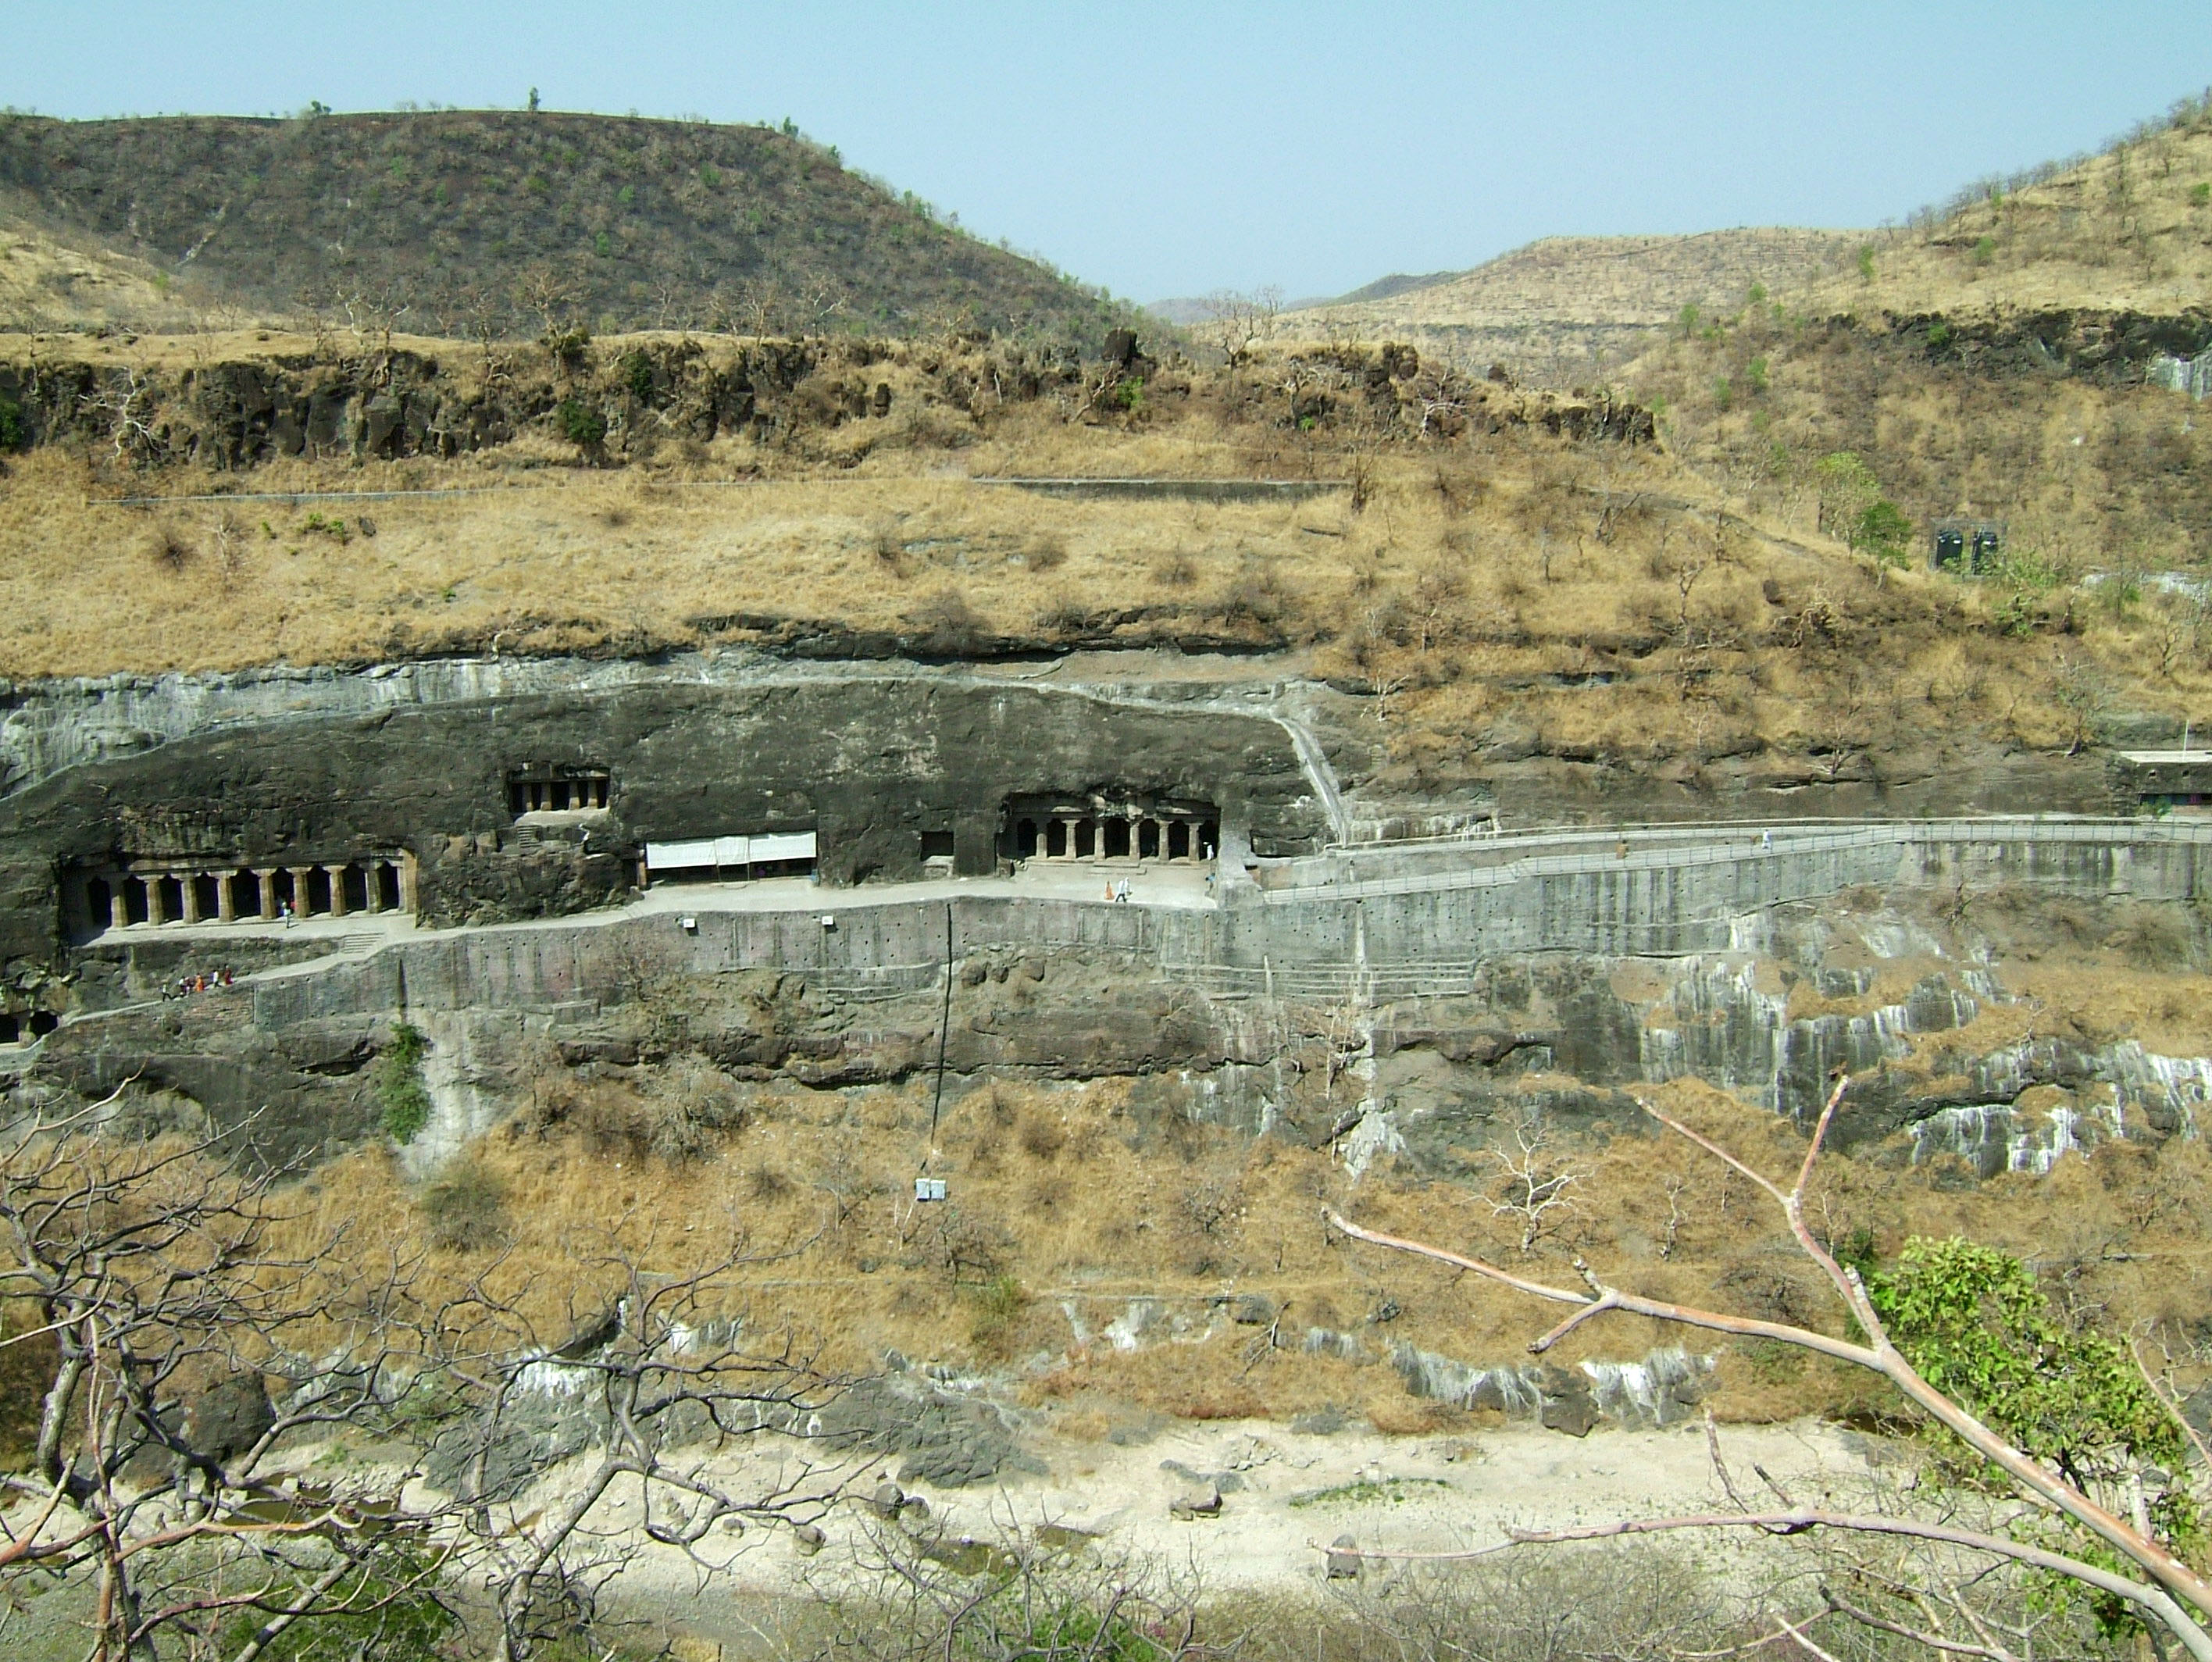 Marathwada Ajanta Caves entrance India Apr 2004 09